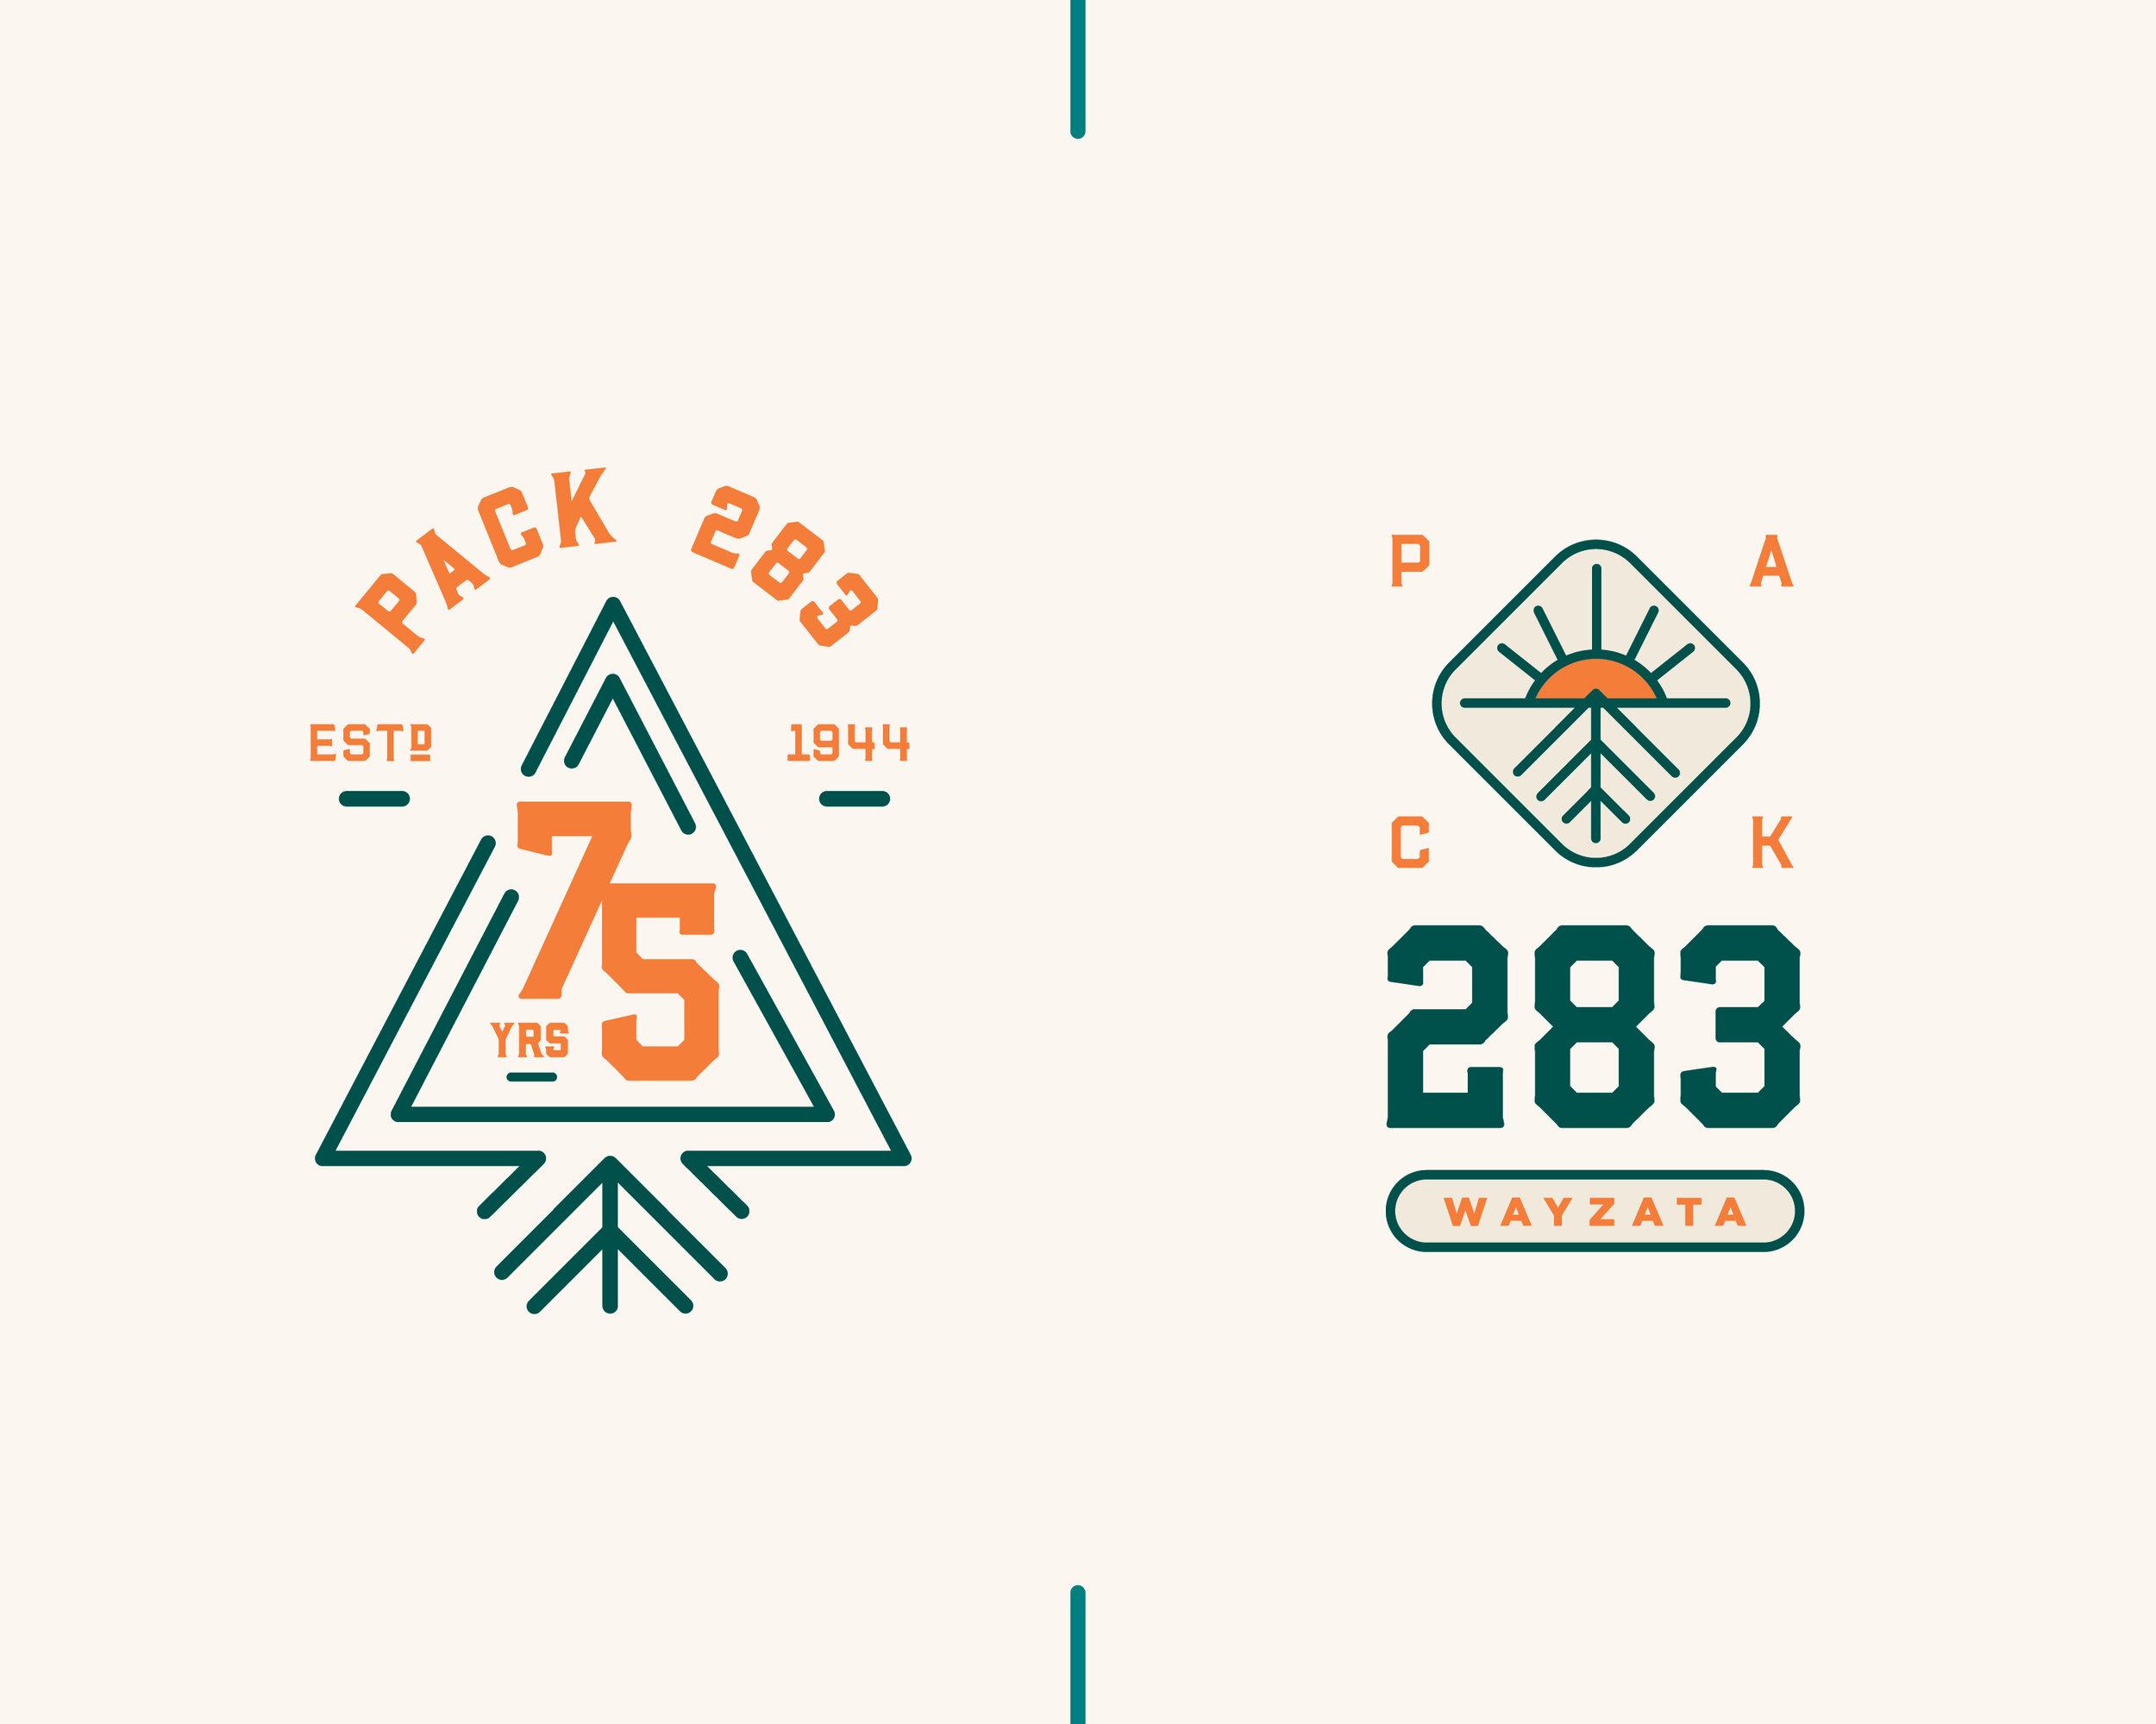 Pack283_SDCo-HOW2_Artboard 1 copy 4.jpg